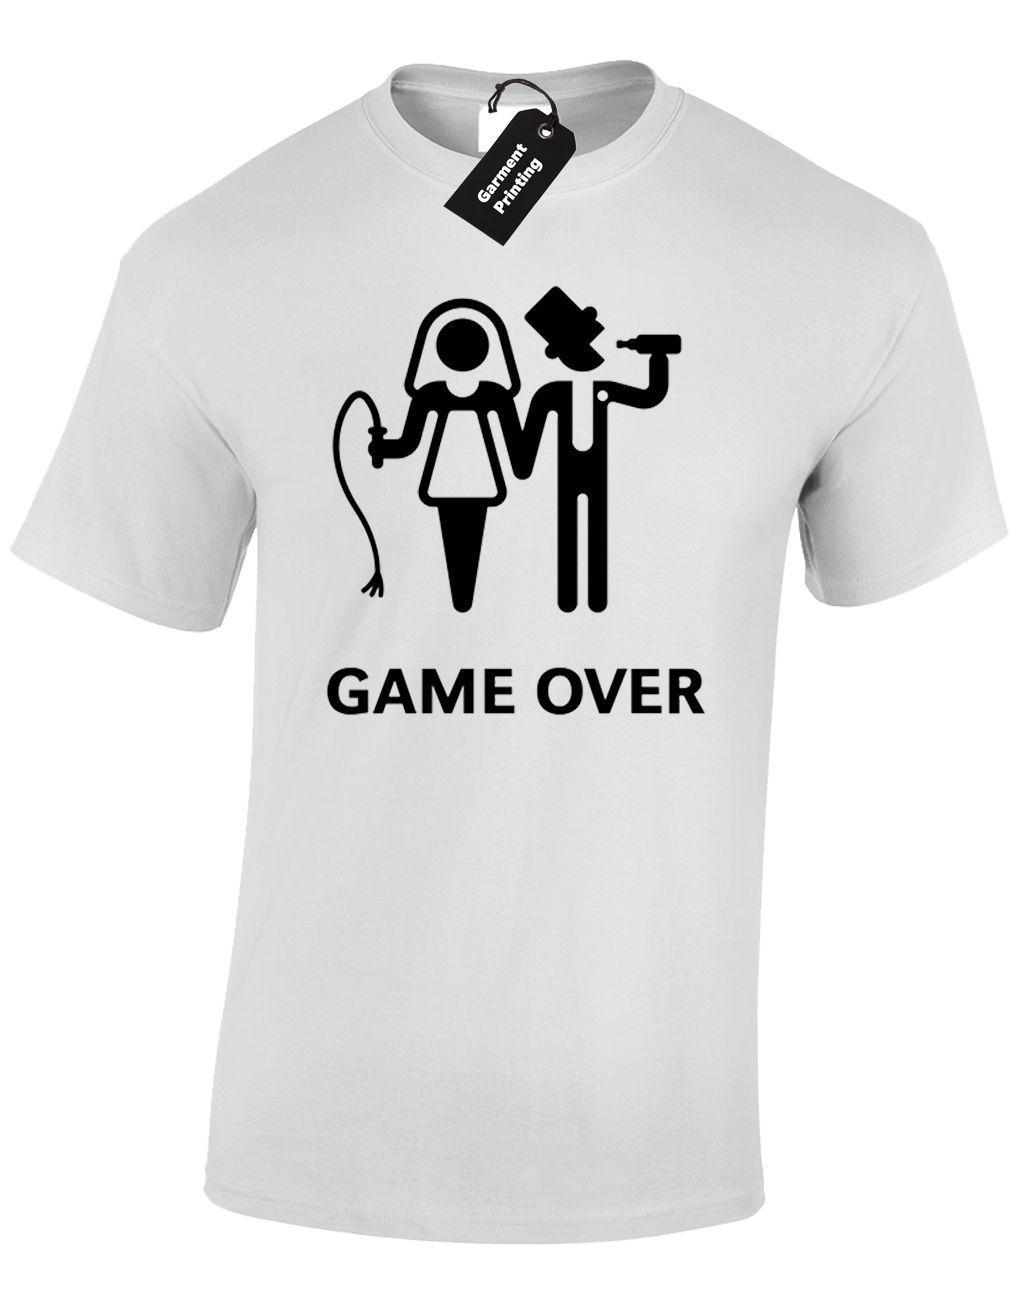 9e3b0644 GAME OVER MENS T SHIRT FUNNY WEDDING BRIDE GROOM DESIGN GIFT PRESENT JOKE  HUMOUR T Shirts Sale Novelty Shirts From Shirtsthatrock, $11.01| DHgate.Com